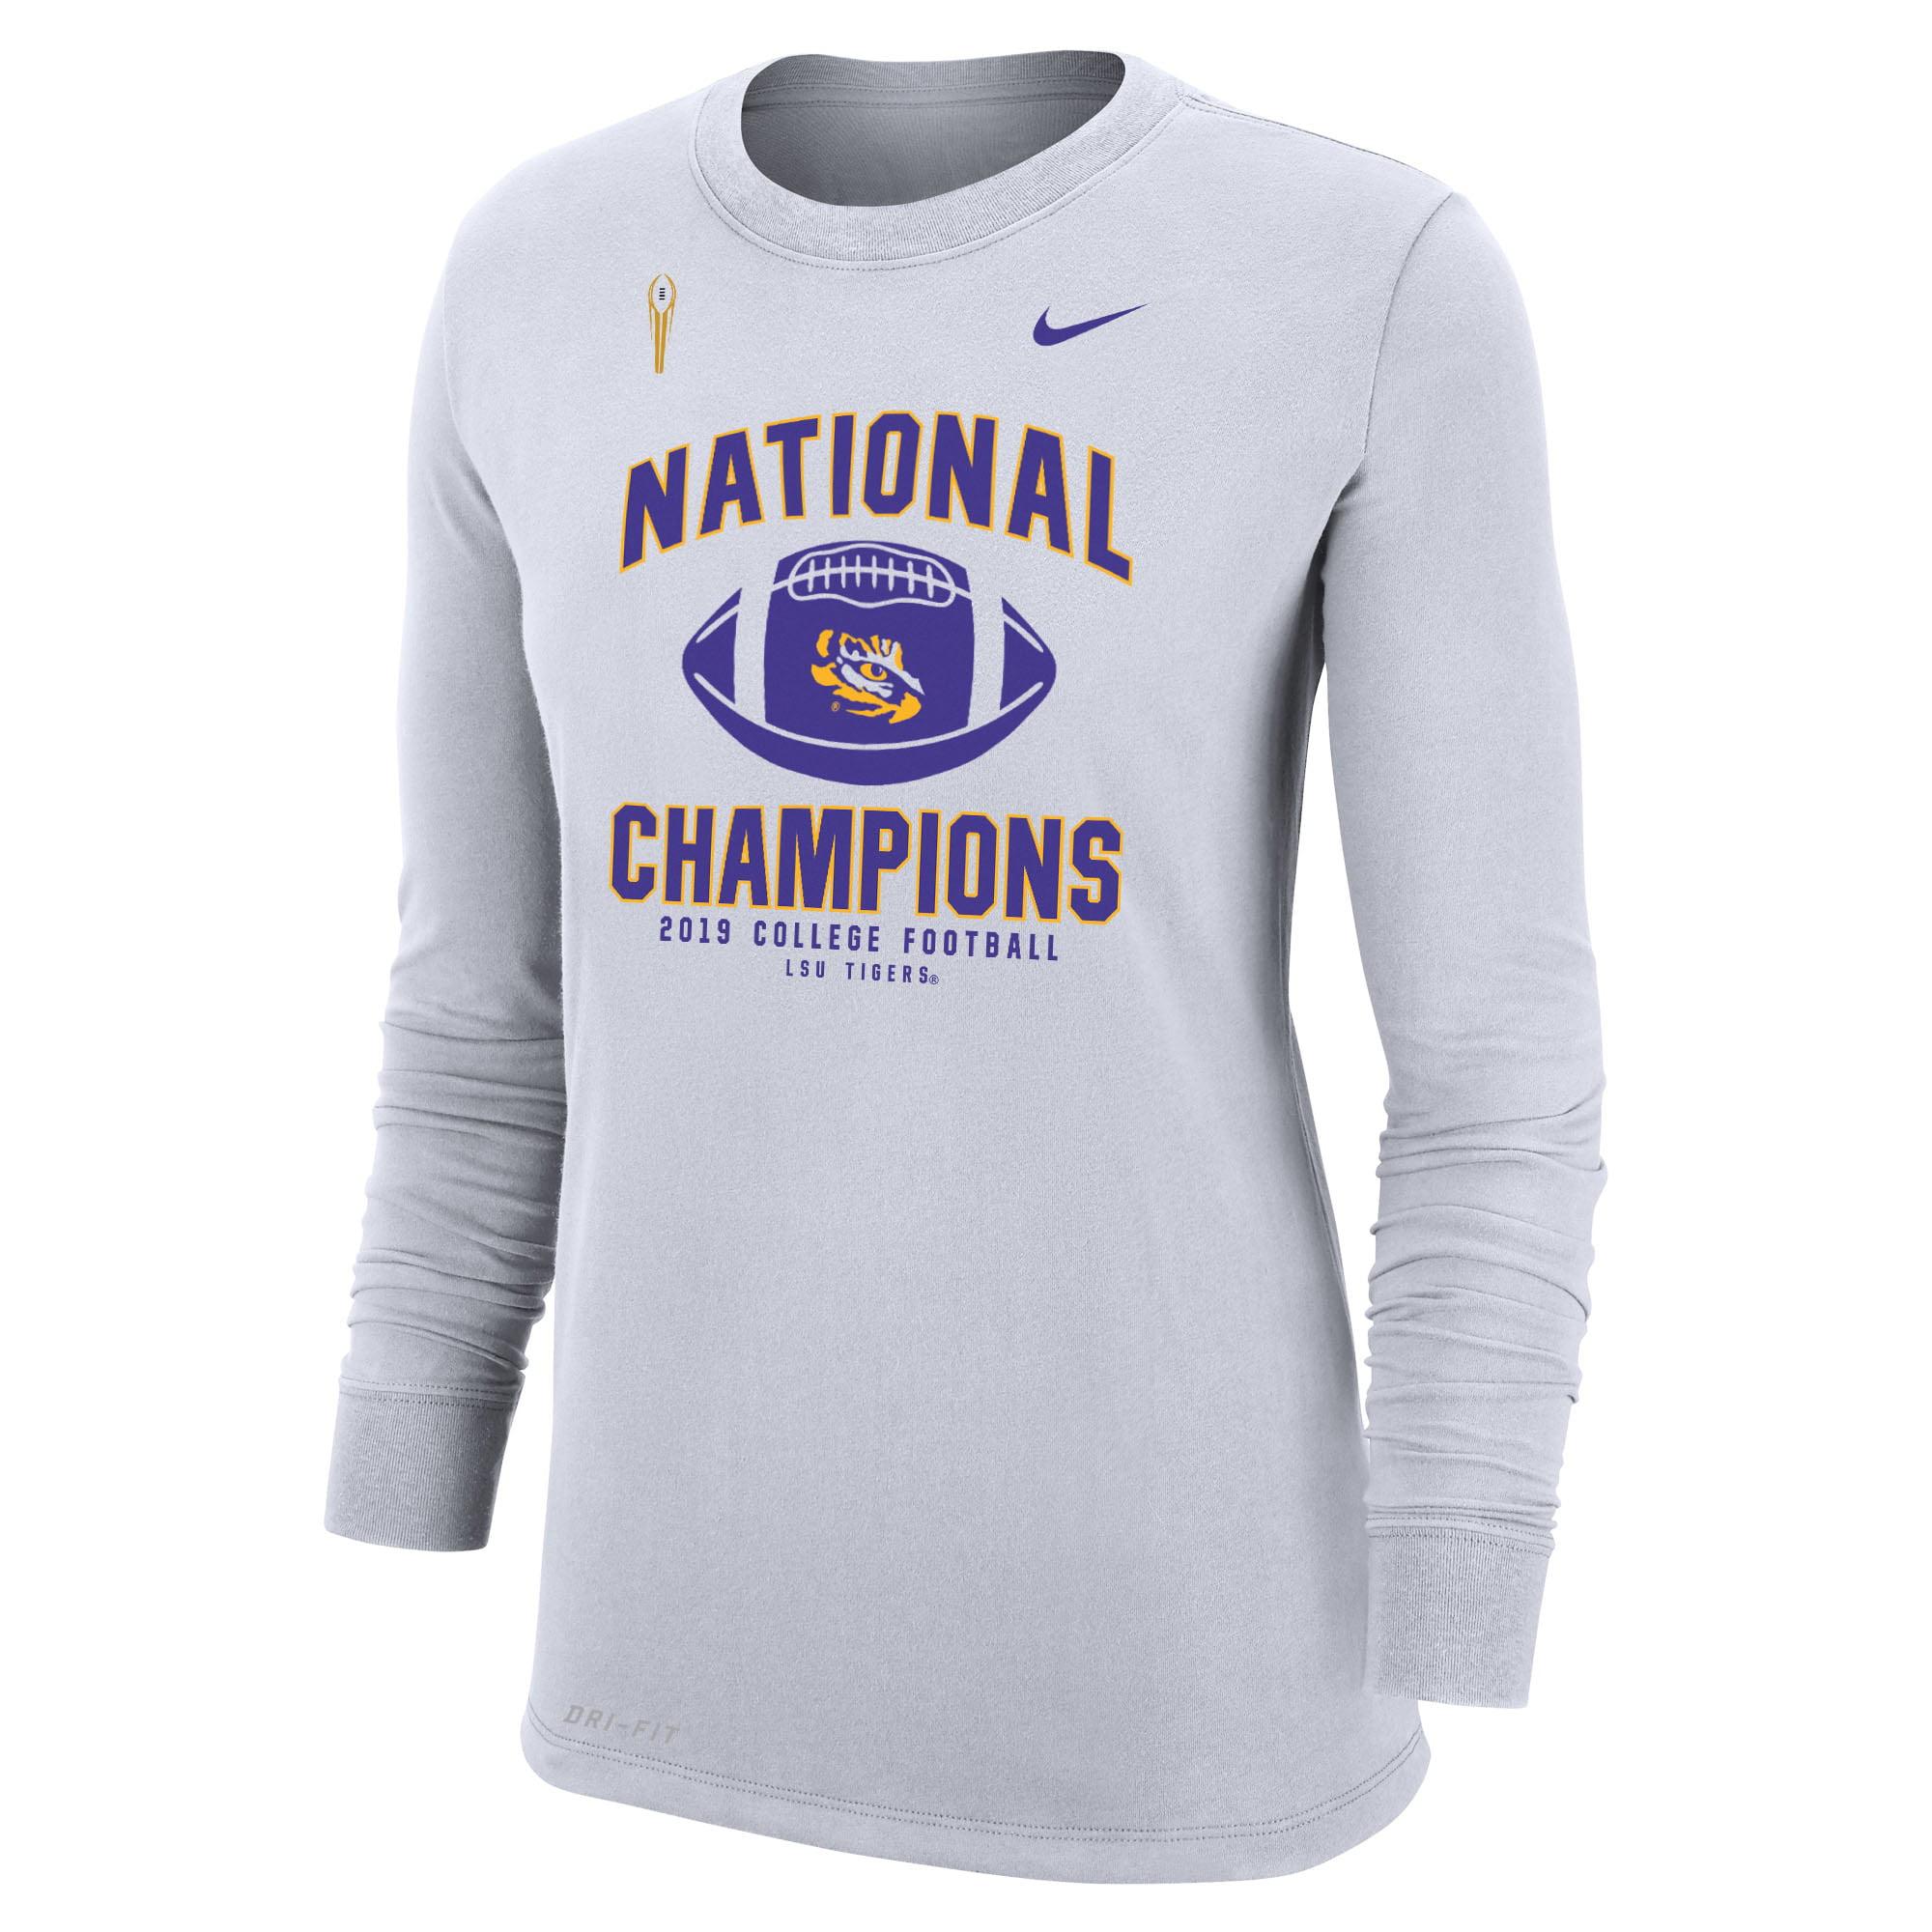 NCAA Womens Sublimated Baseball Tee